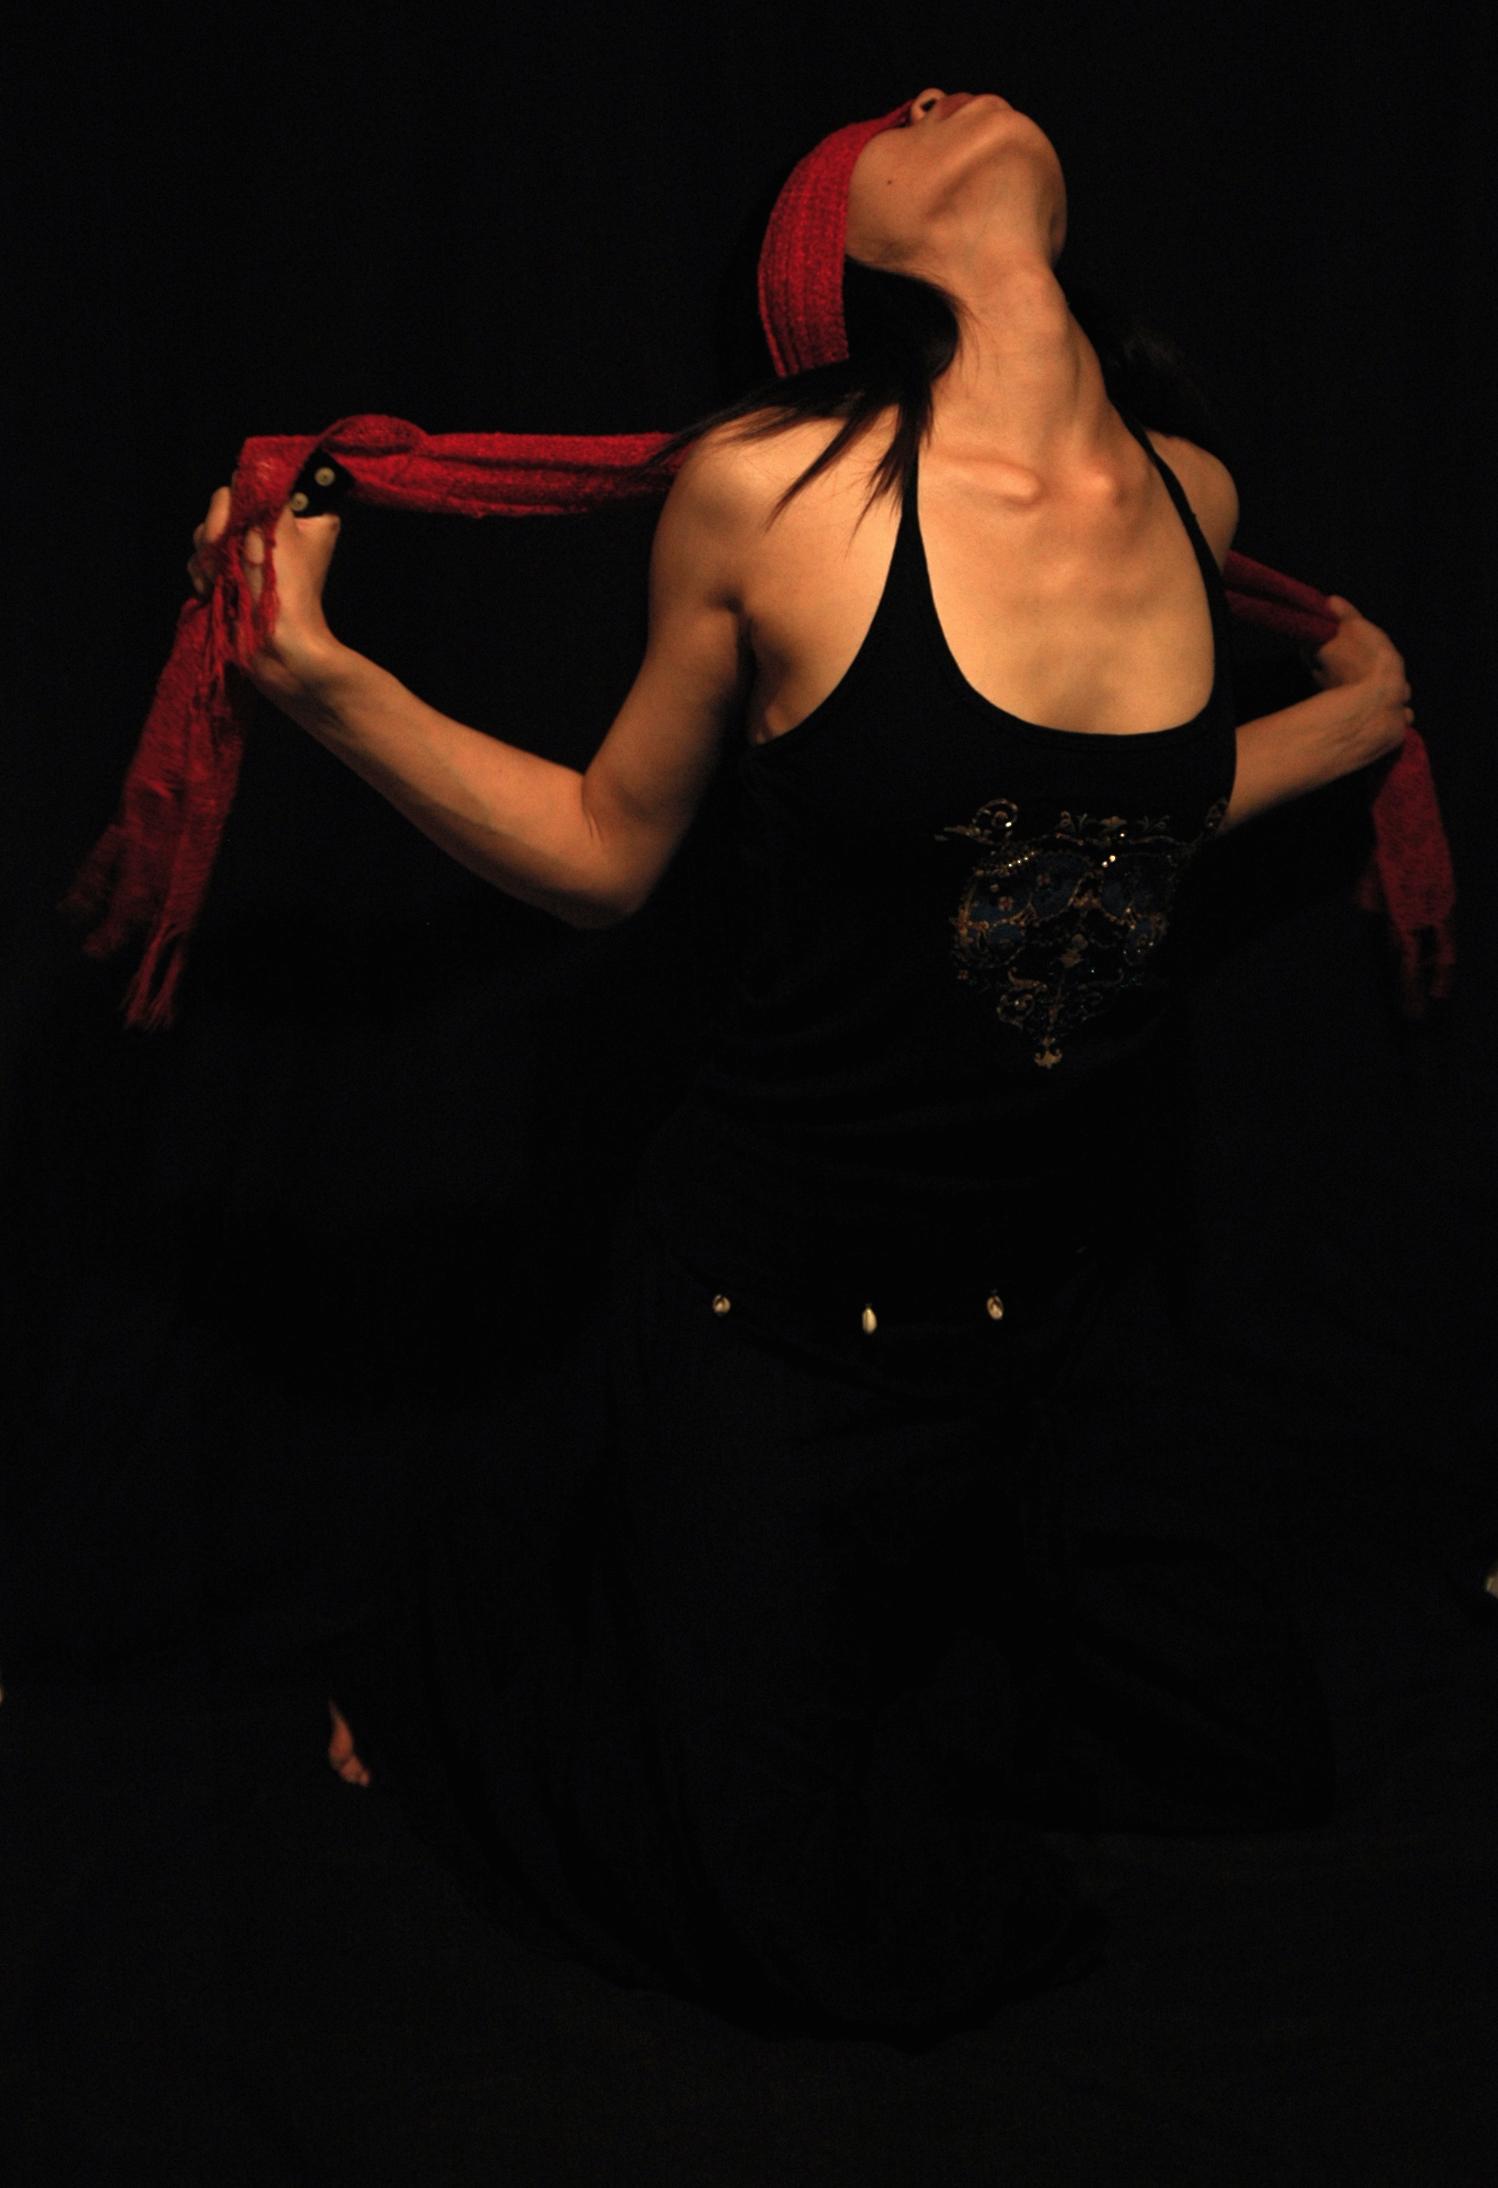 suelynee art nude art artist photography photographer model Taiwan 何書伶 Love desire